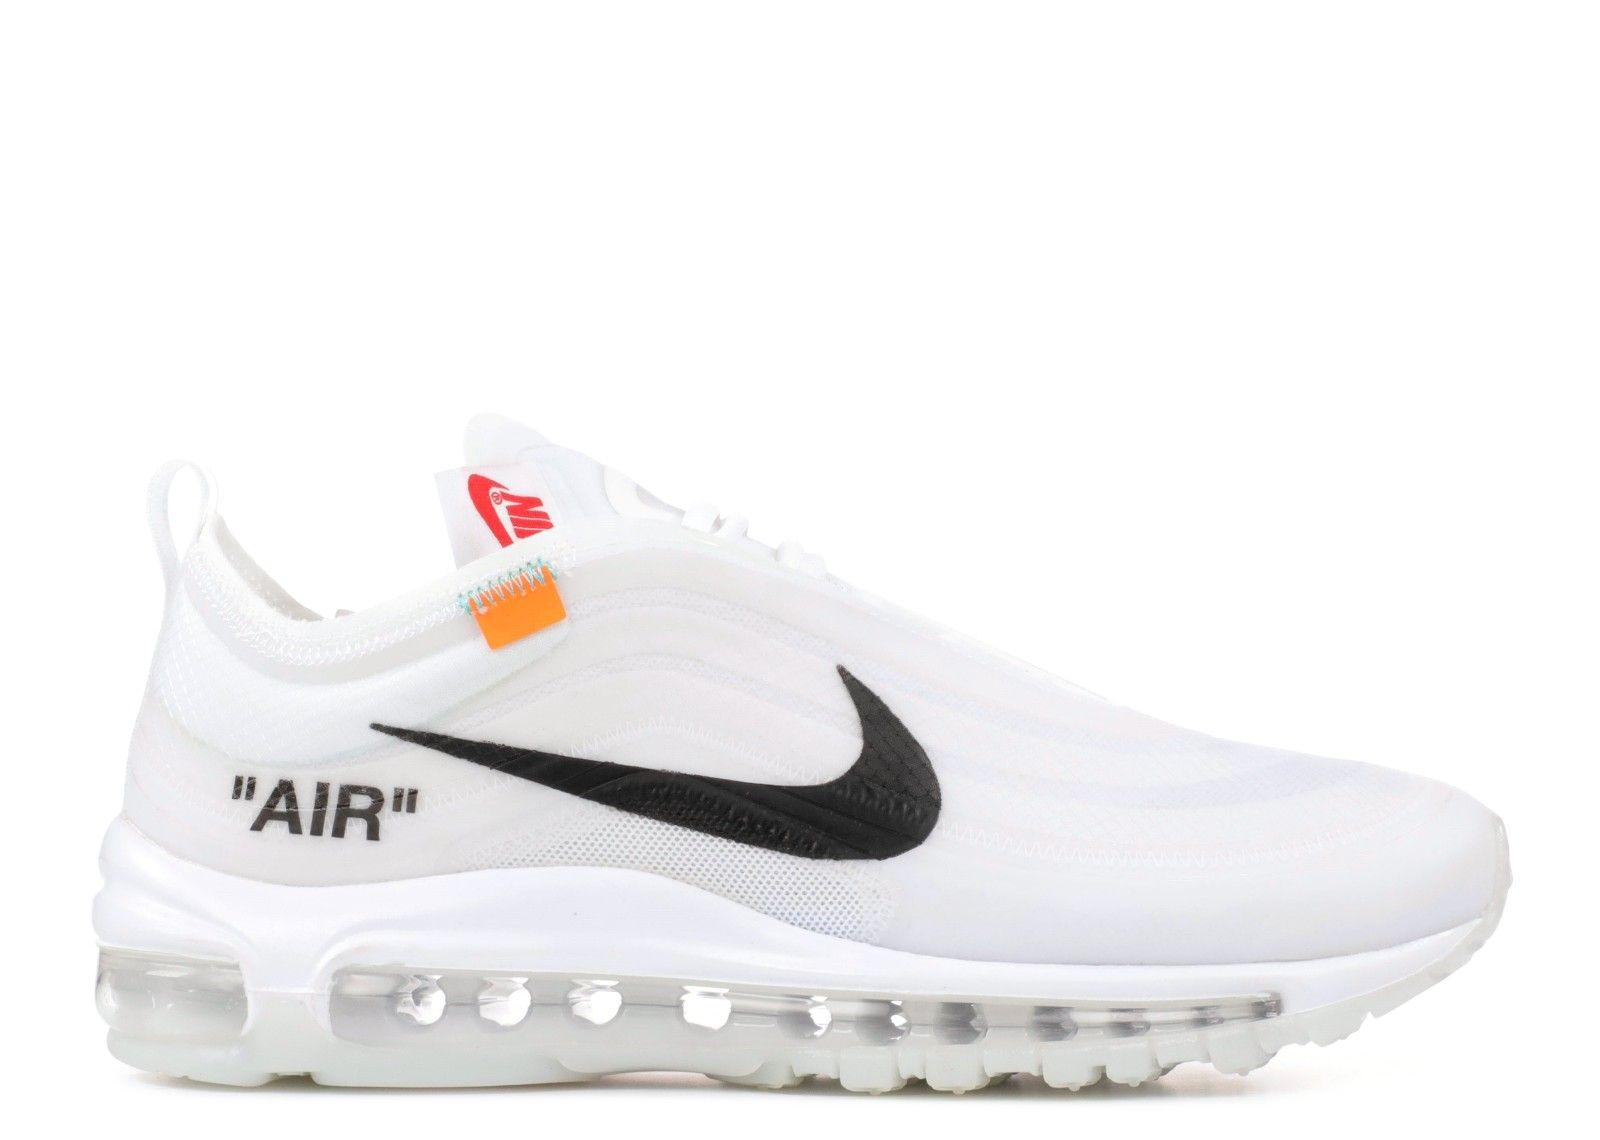 nike store air max 97 ten off white